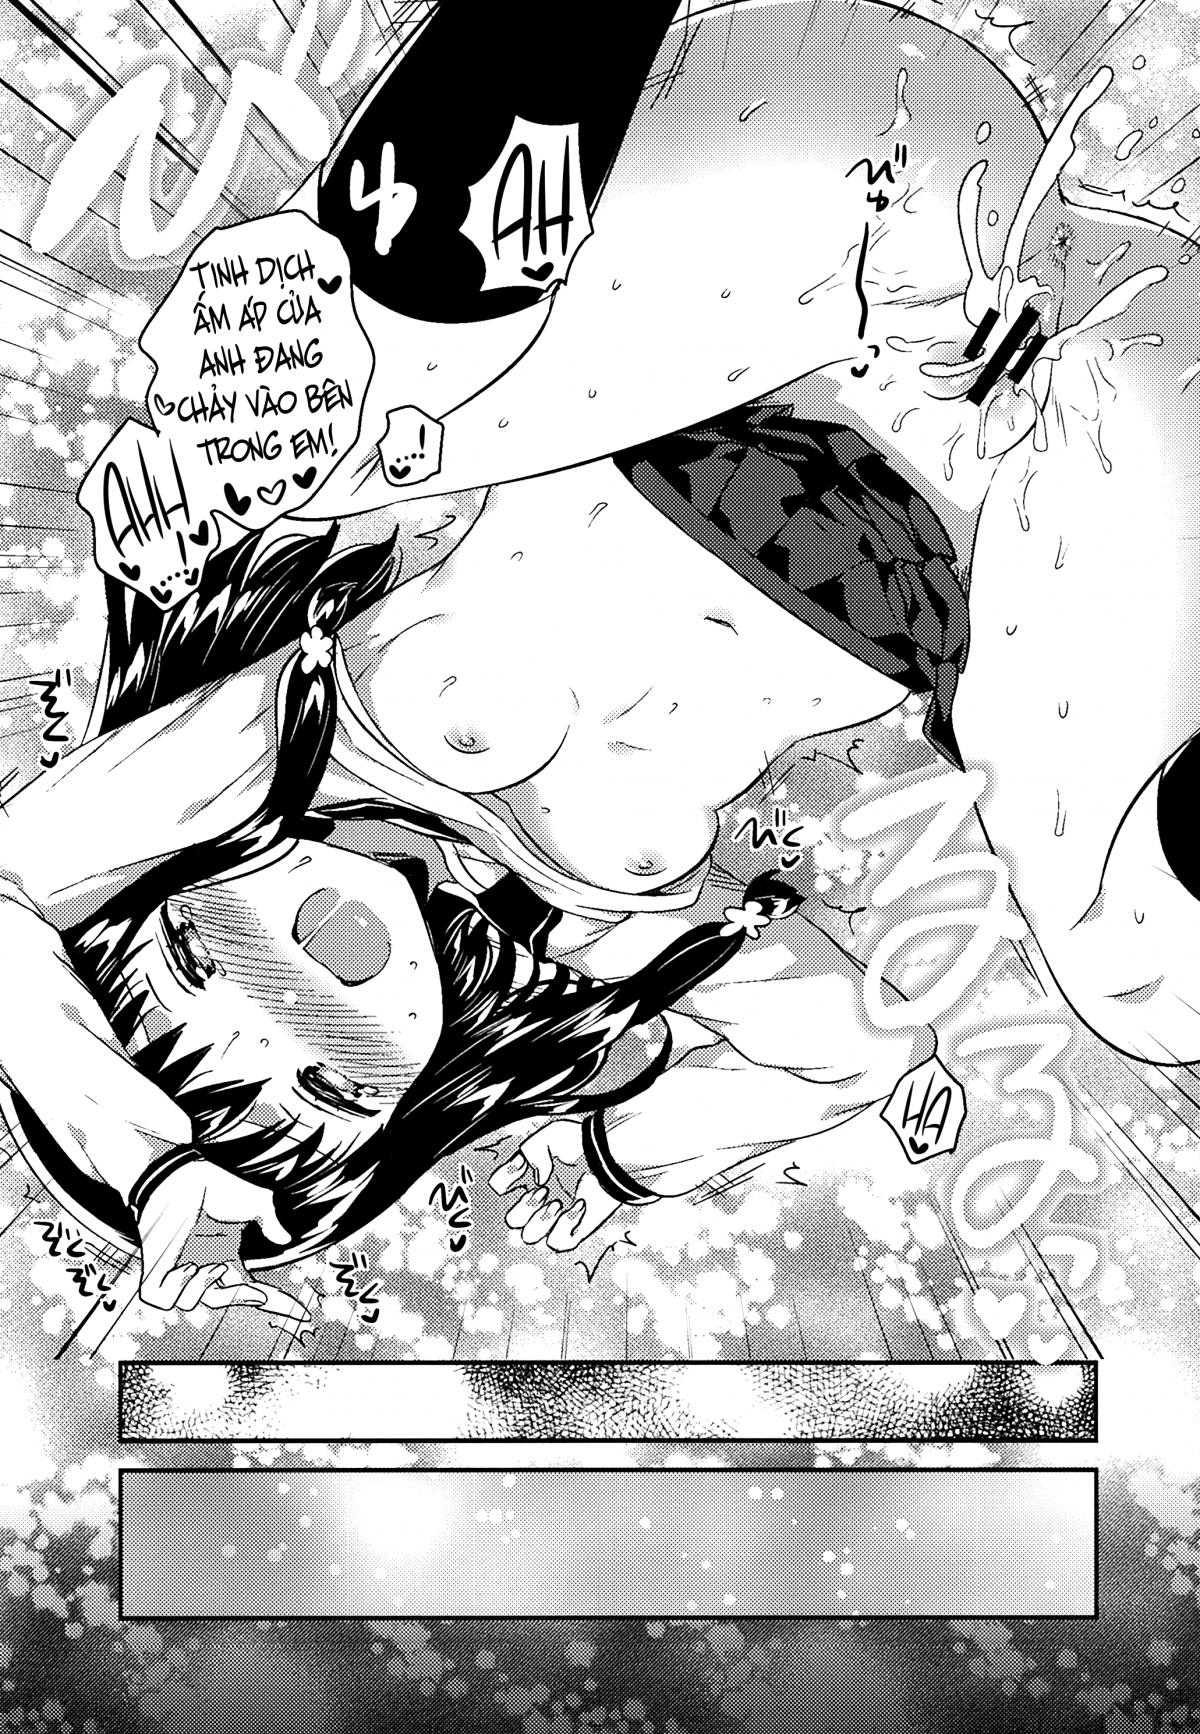 Hình ảnh  trong bài viết Truyện hentai Anoko no Tsumi to Batsu!